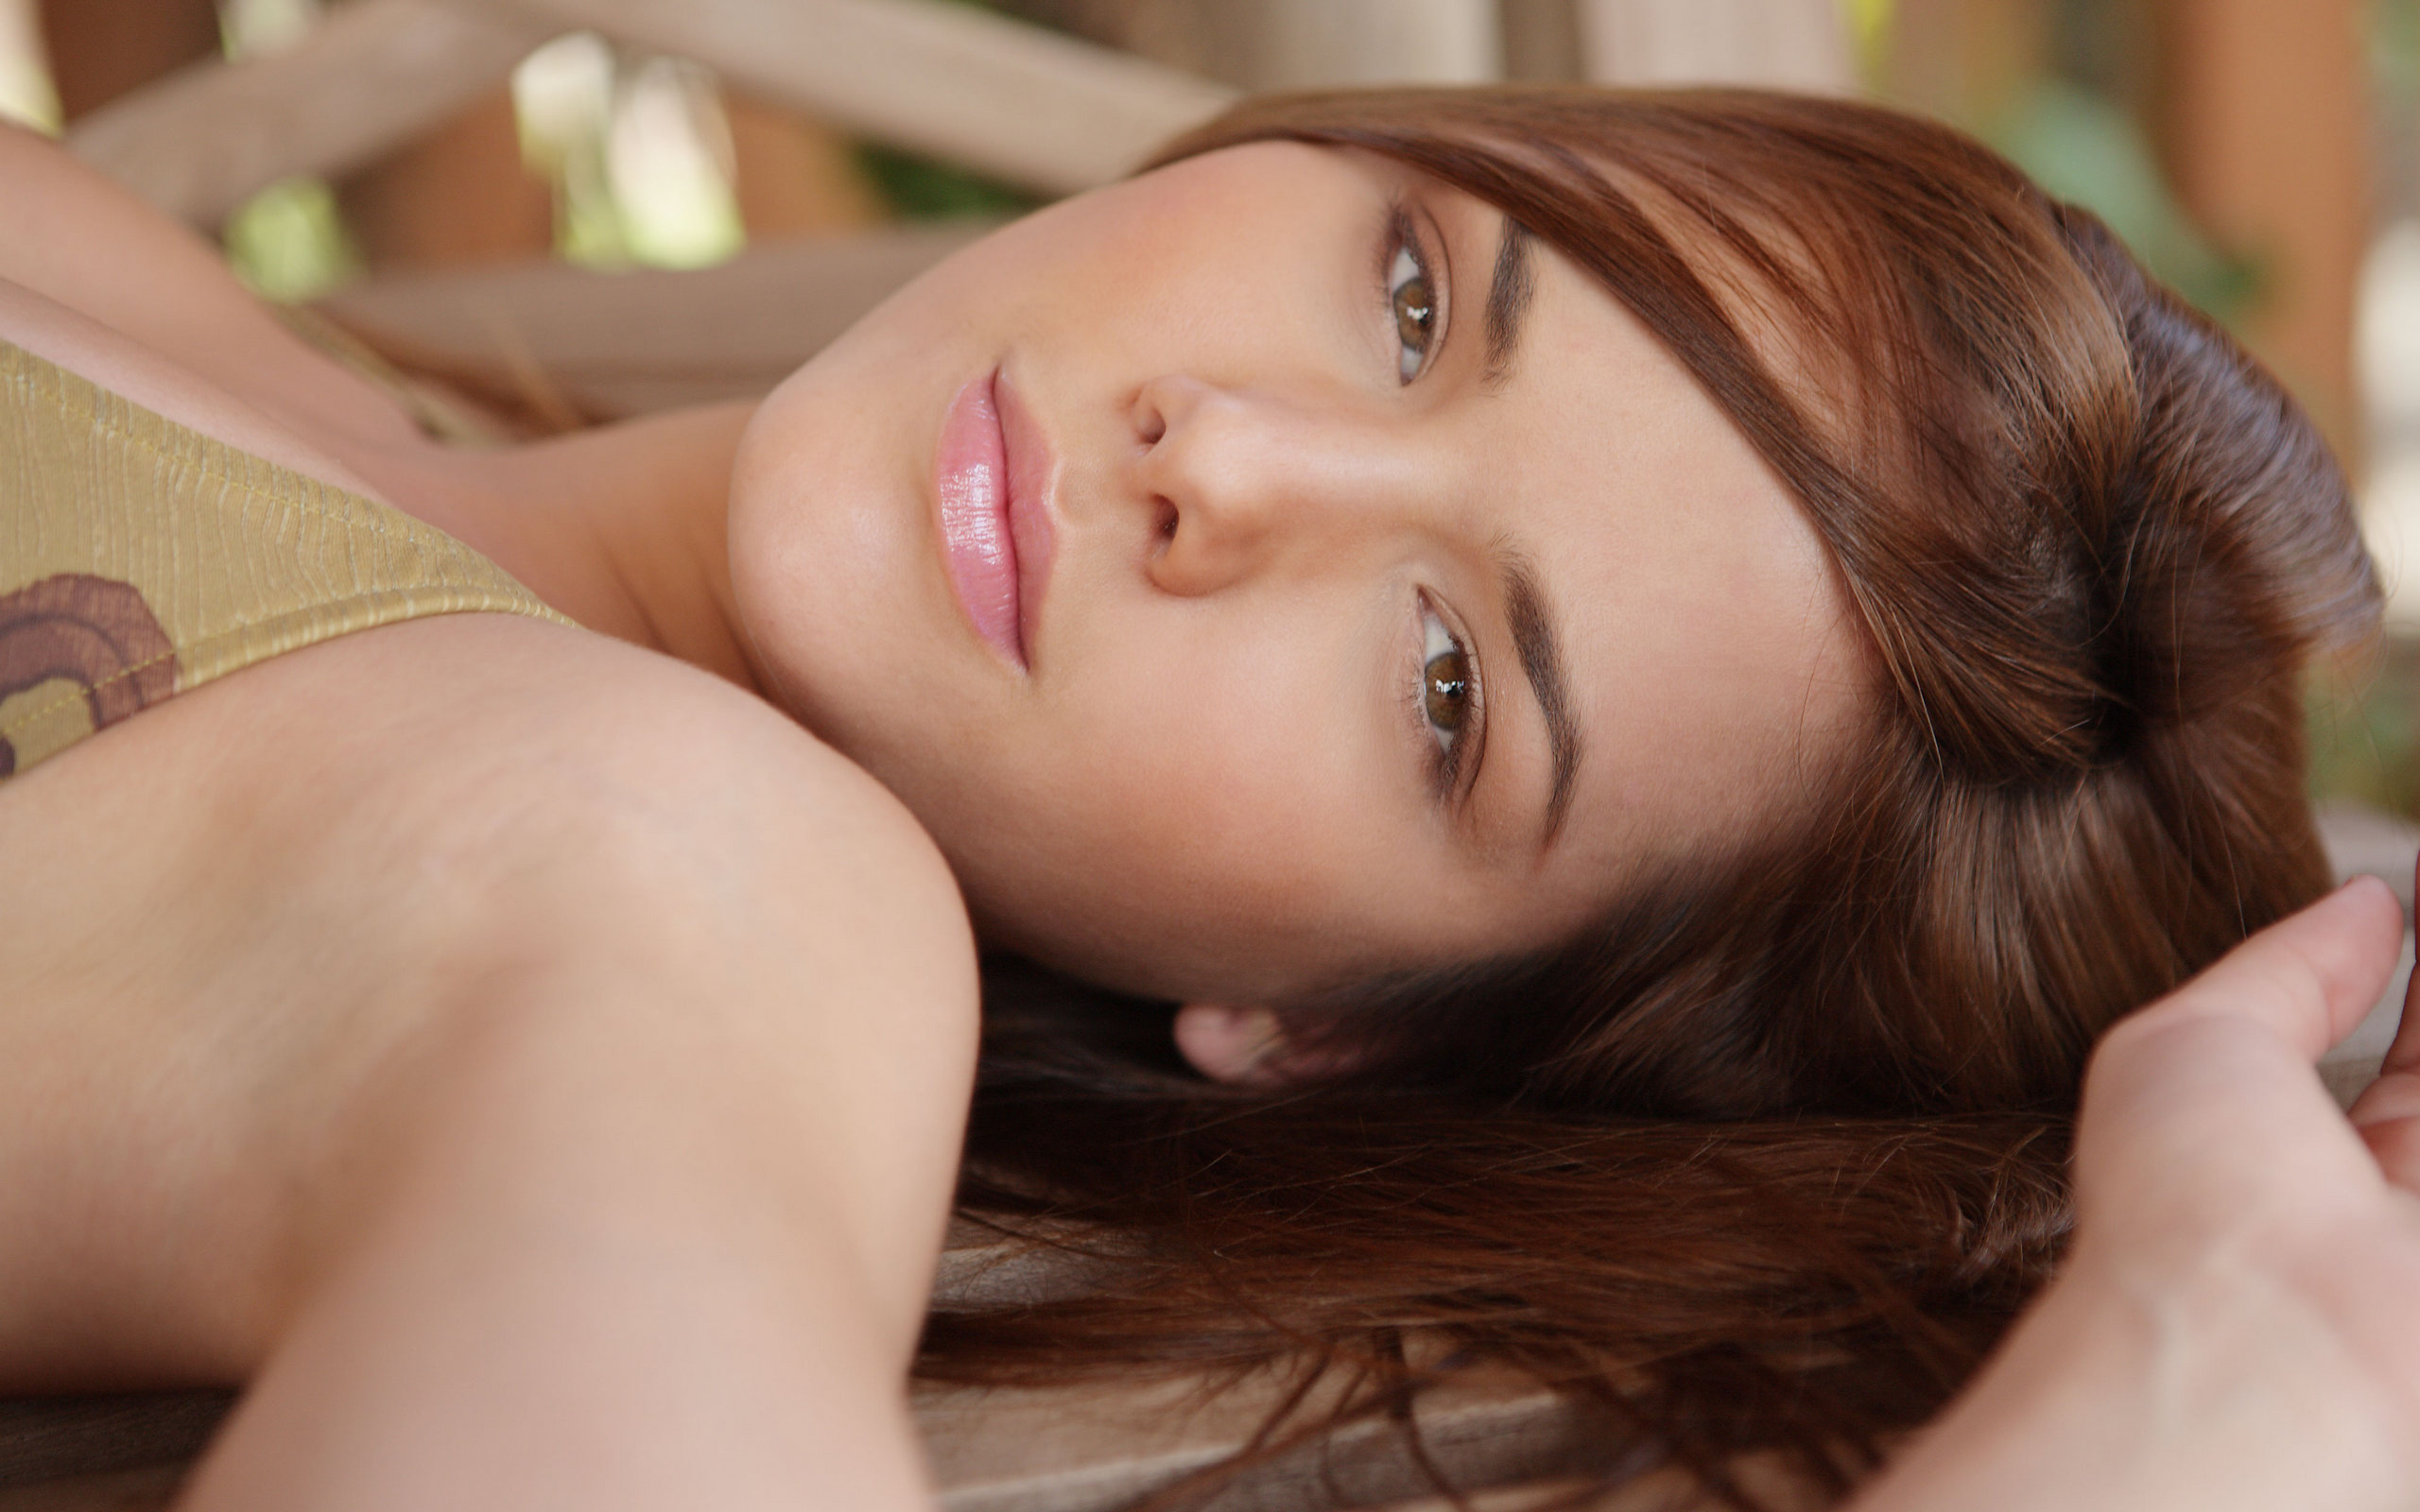 Roberta murgo tits #9